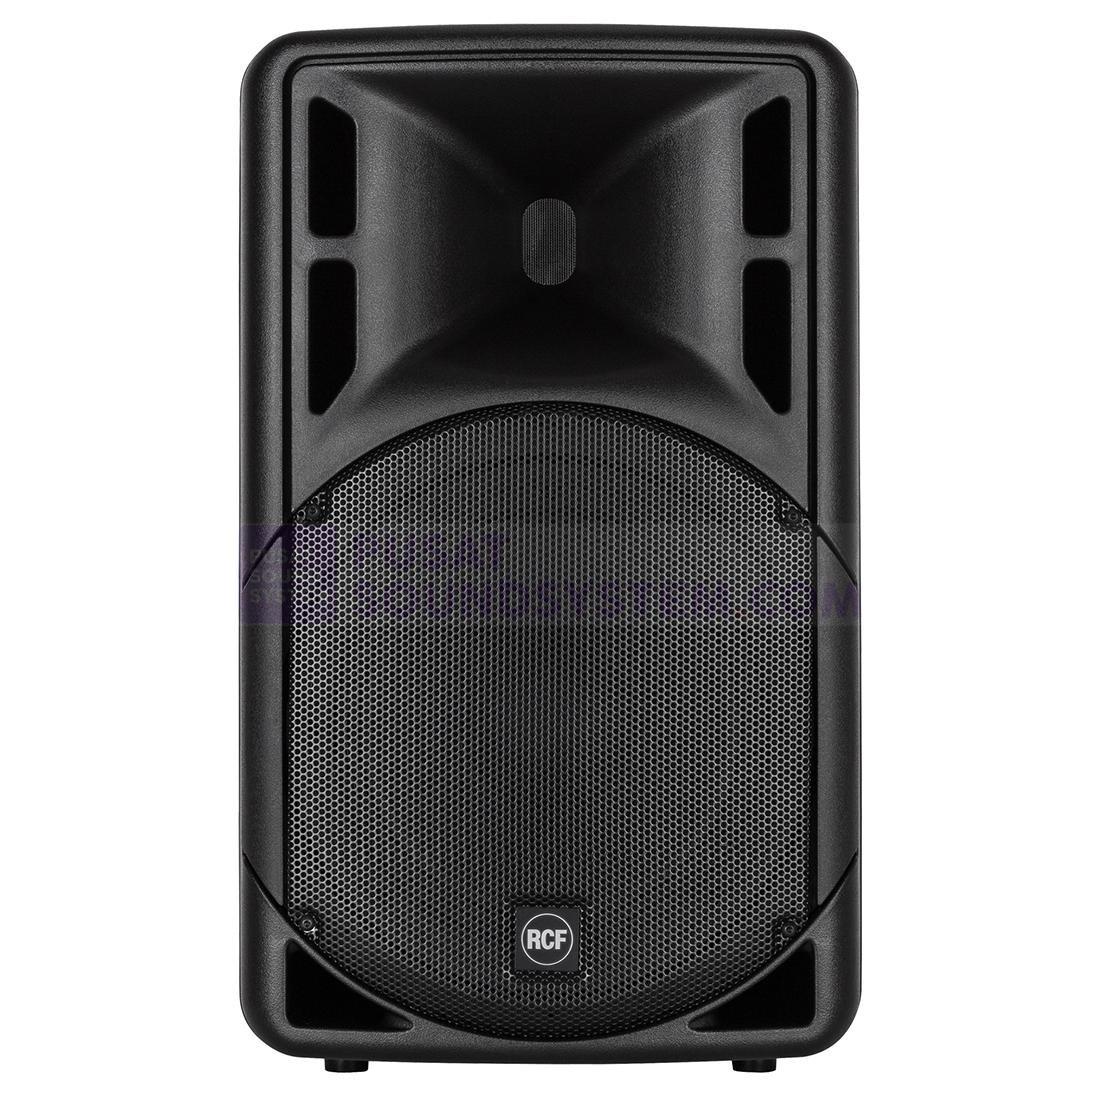 Jual RCF ART 312-A MK4 Speaker Aktif 12 Inch